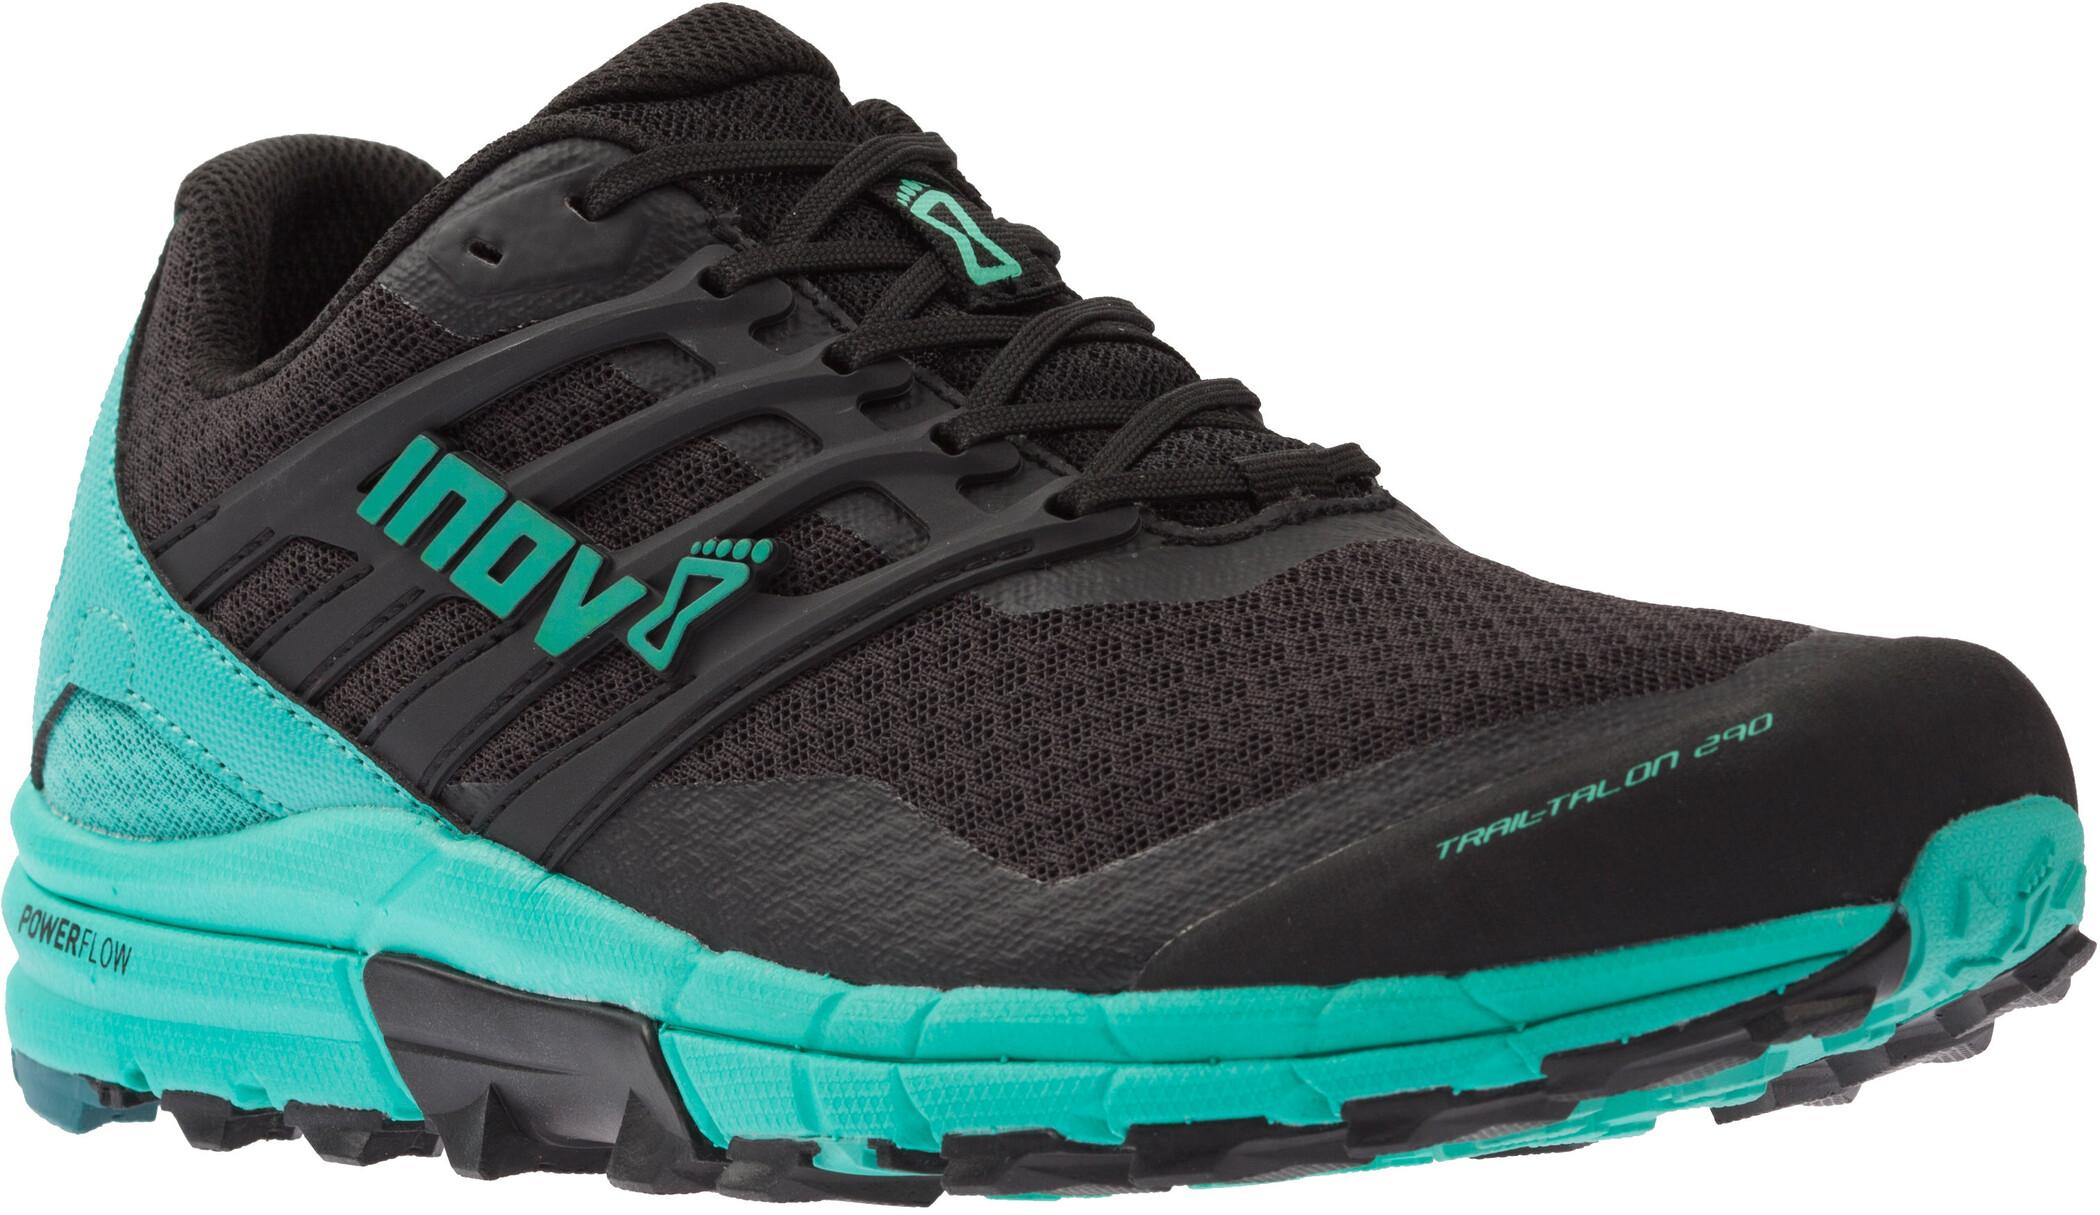 inov-8 Trailtalon 290 Sko Damer, black/teal   Shoes and overlays